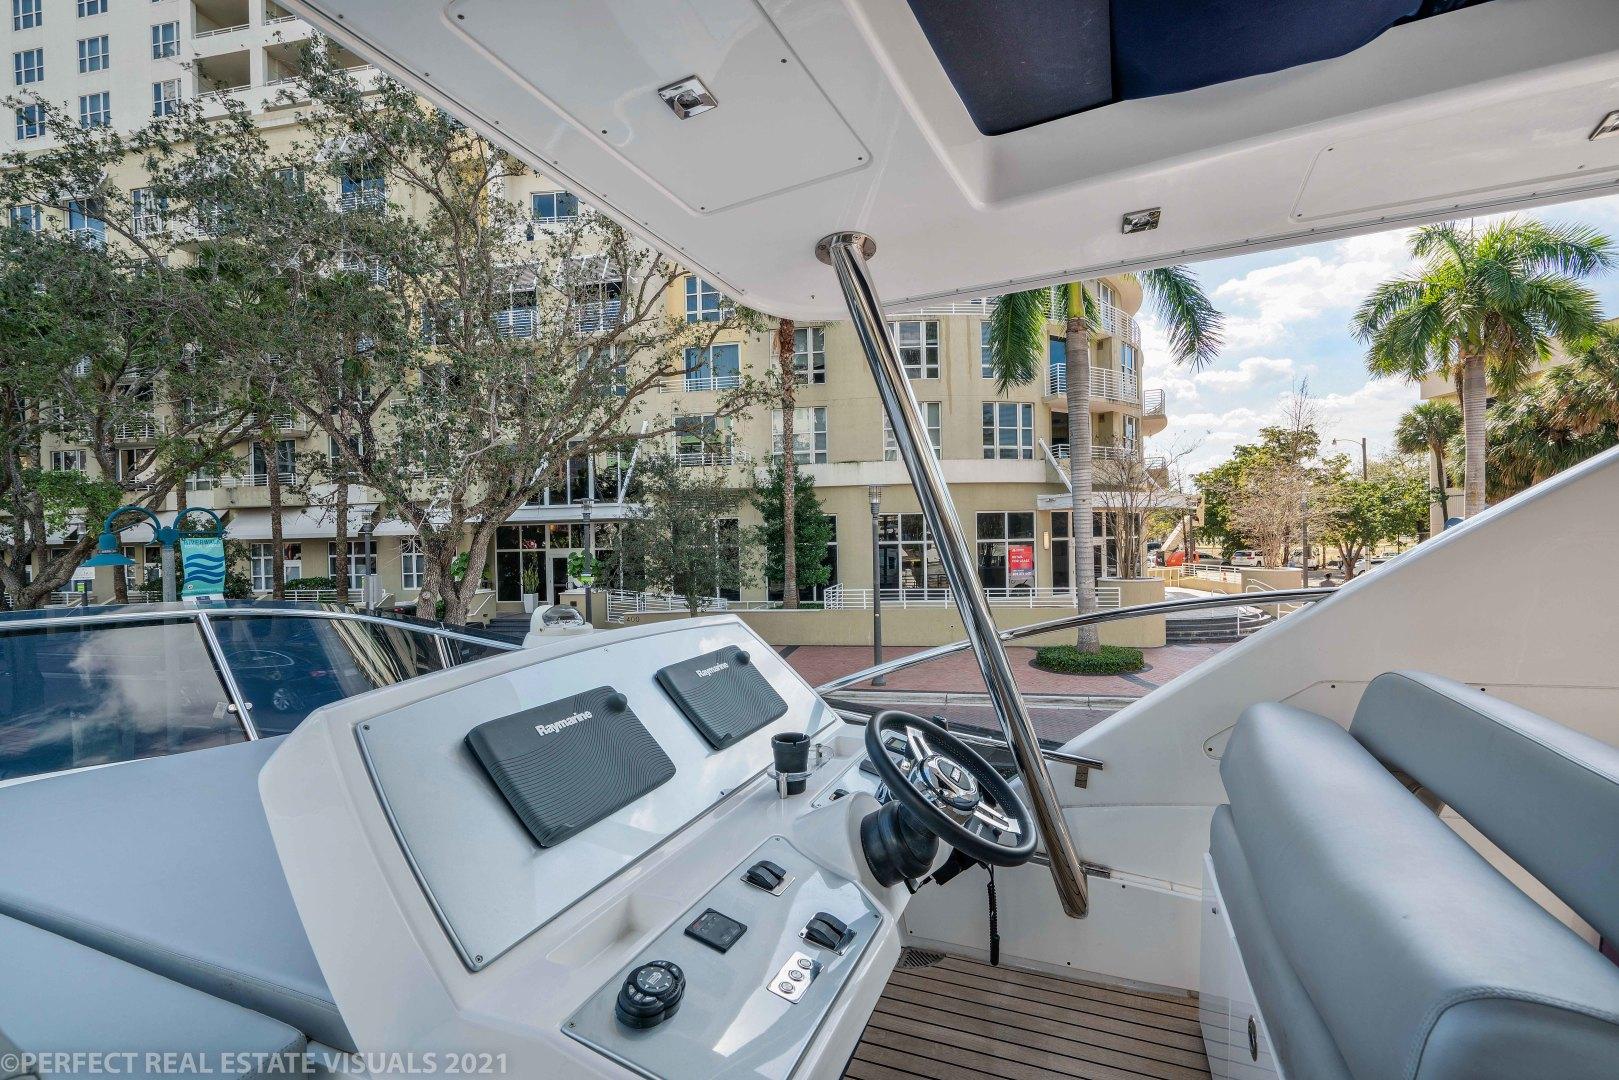 Schaefer-640 2017 -Fort Lauderdale-United States-1600592 | Thumbnail